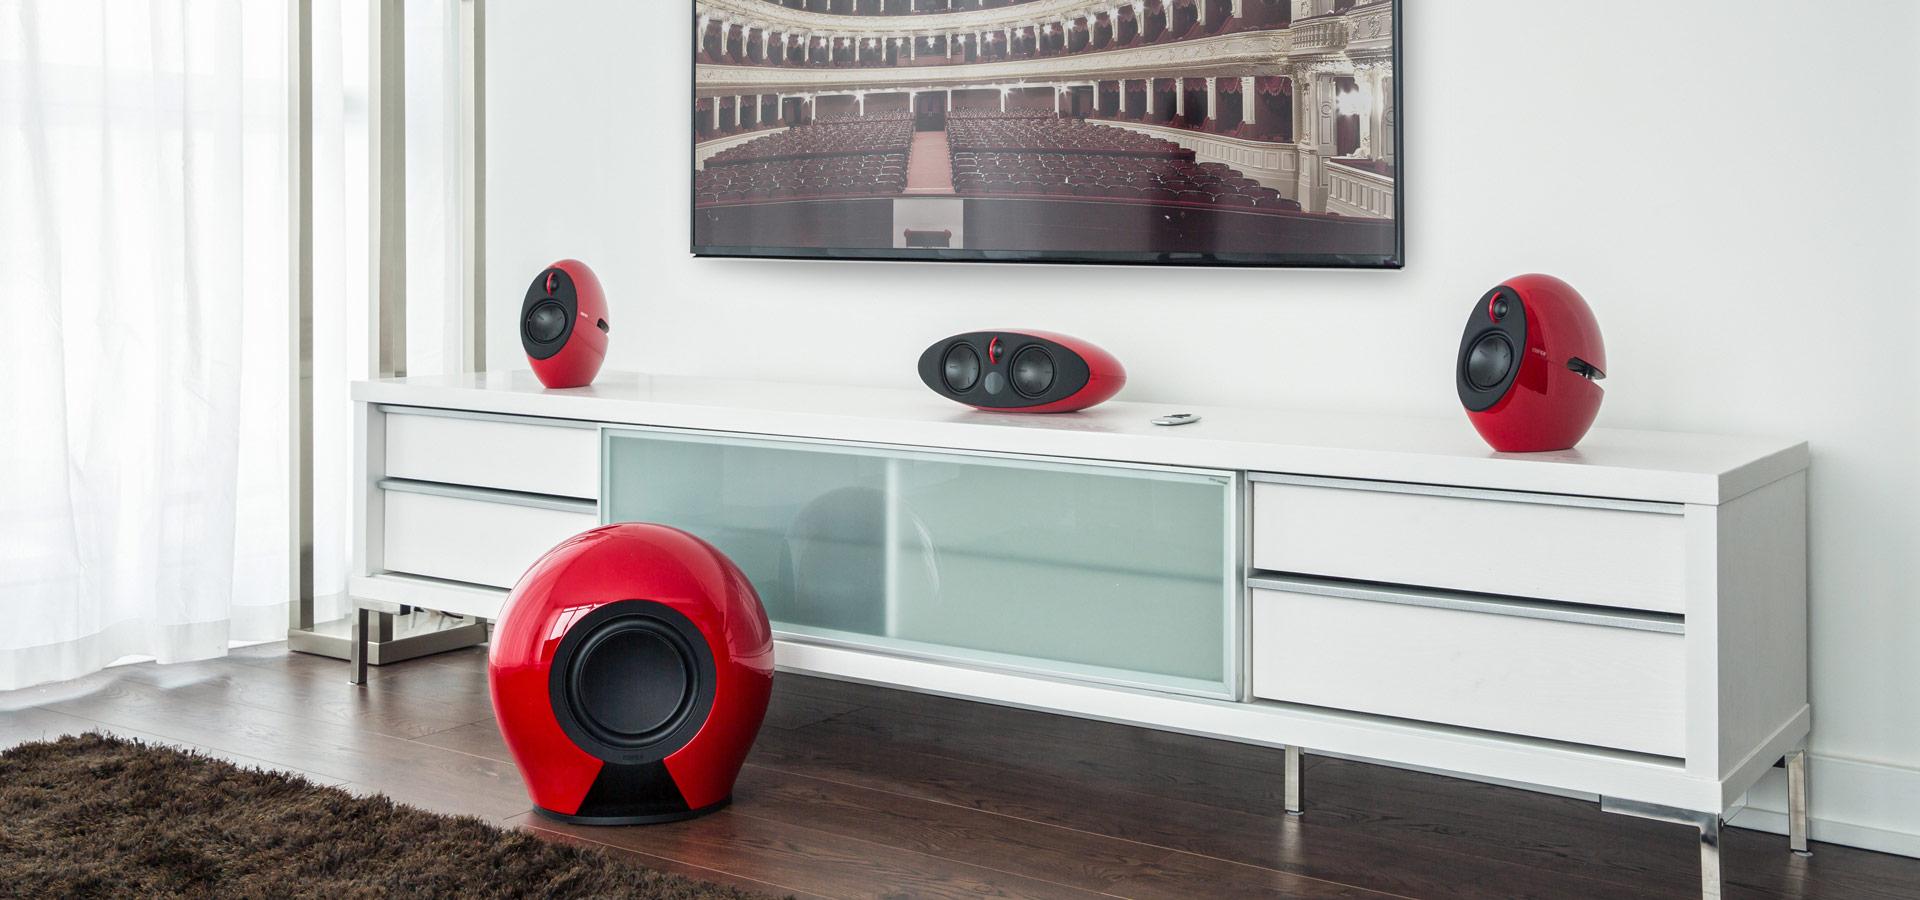 e255 Luxury Home Theatre Speaker System